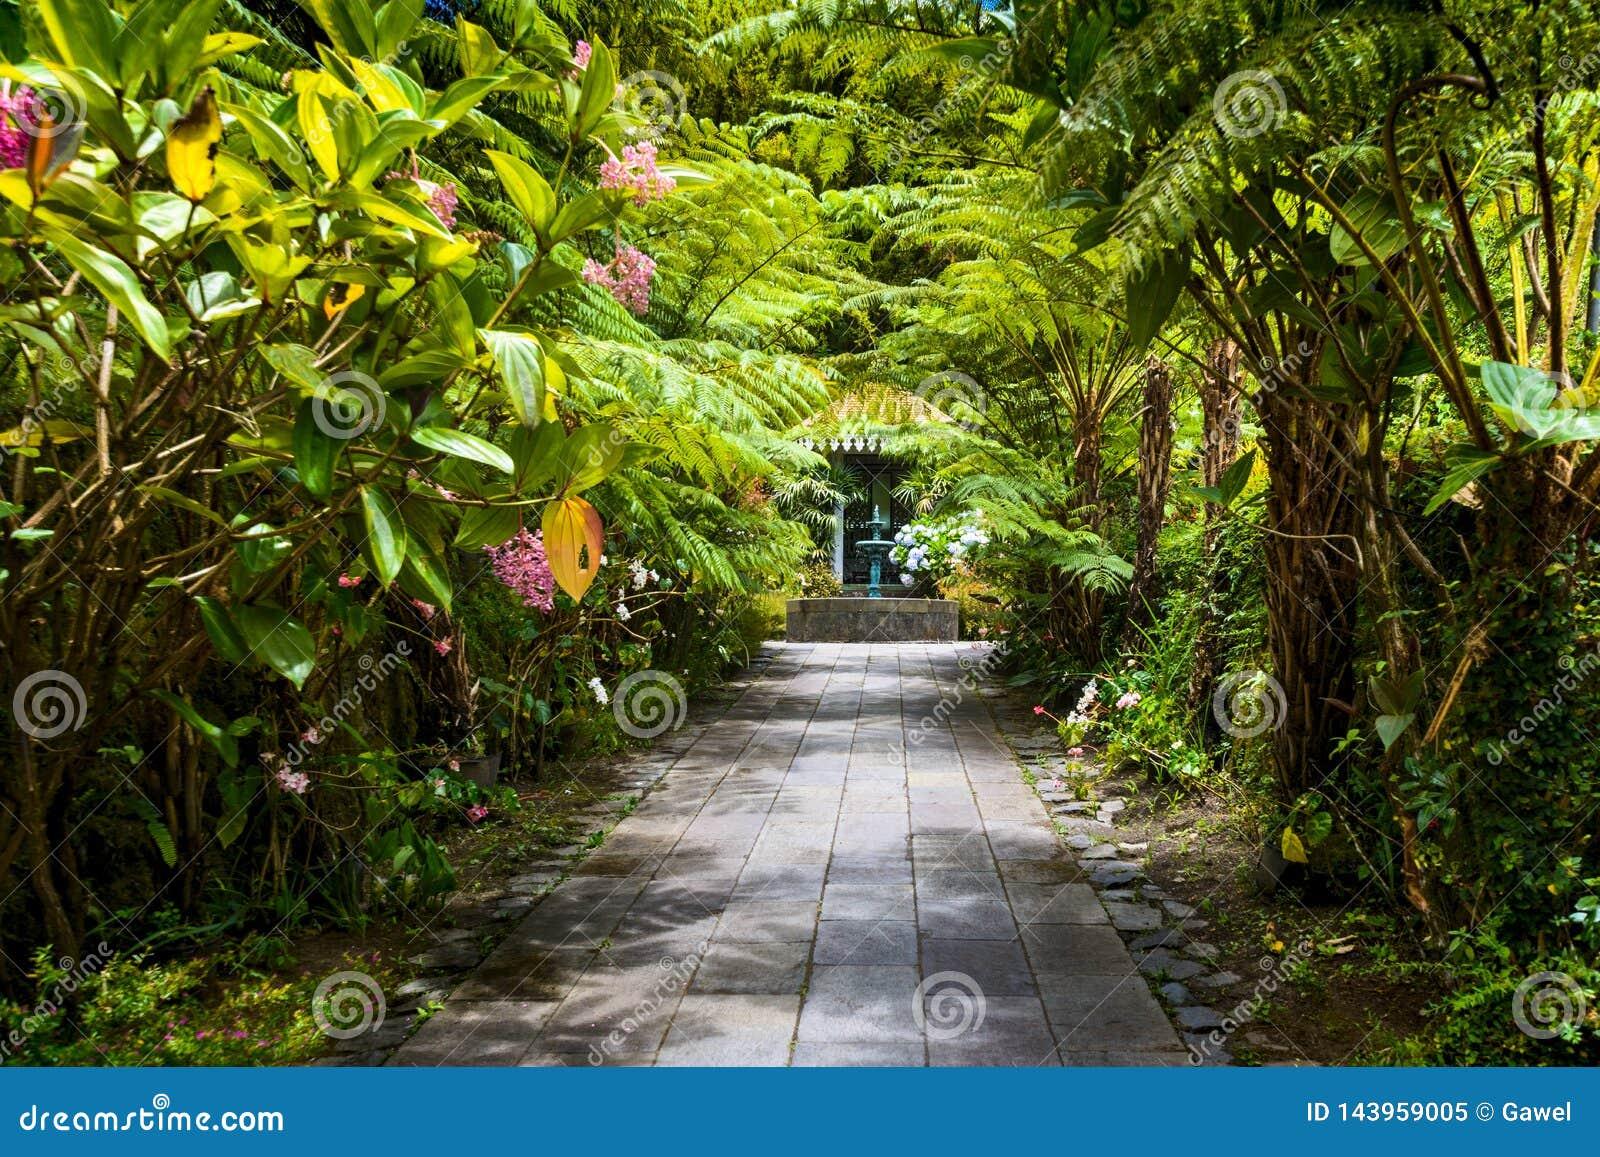 Folio de Maison del La del jardín botánico, Salazie, Reunion Island